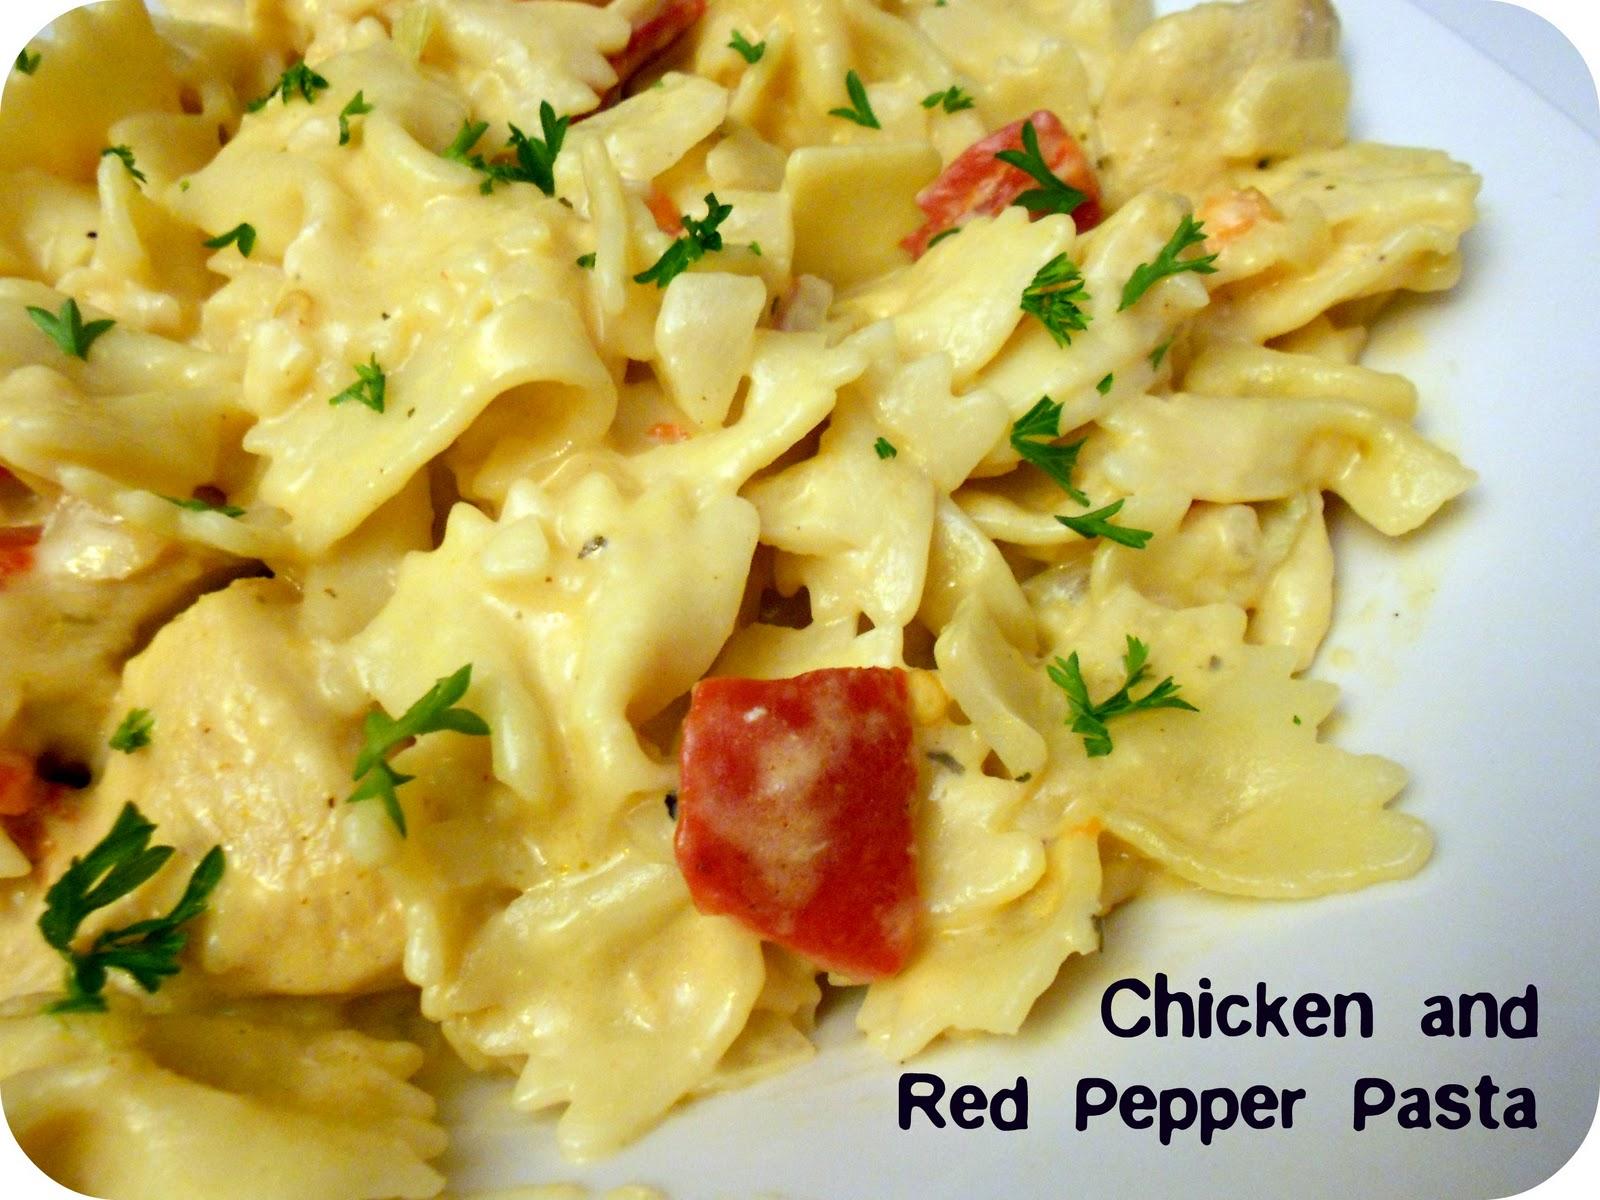 Creamy Chicken With Broccoli And Red Pepper Pasta Recipe ...